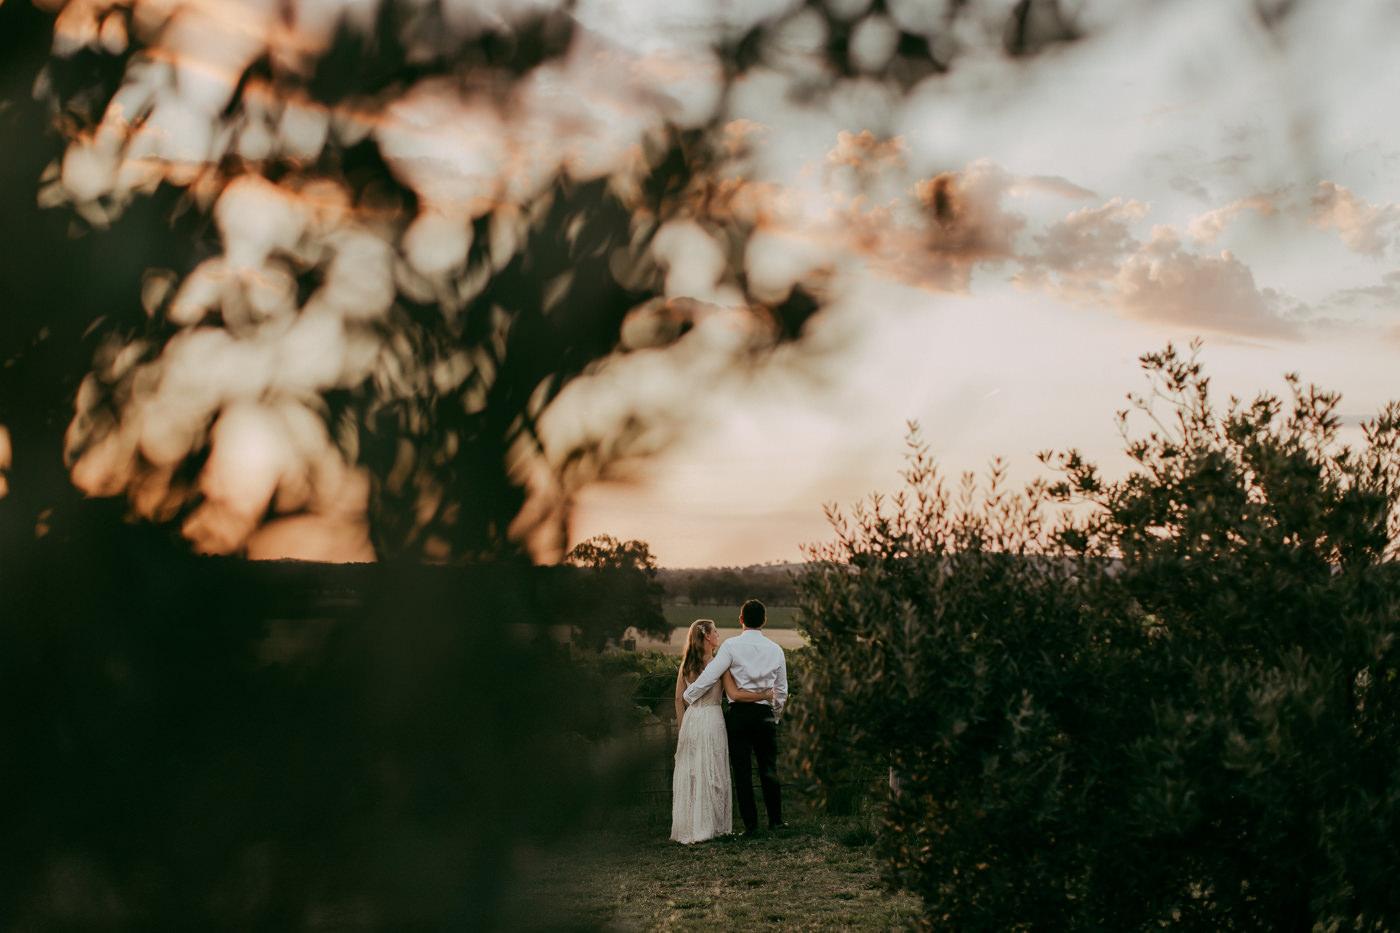 Anthony & Eliet - Wagga Wagga Wedding - Country NSW - Samantha Heather Photography-161.jpg